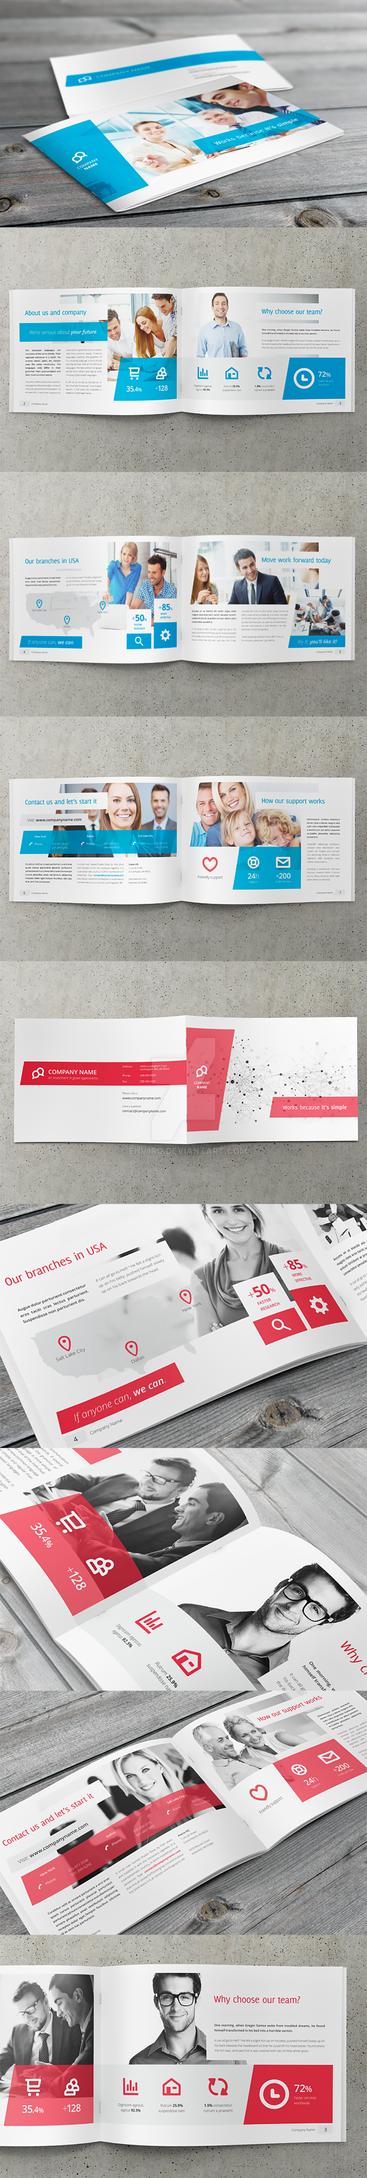 Business, Corporate Multi-purpose A4 Brochure 4 by env1ro